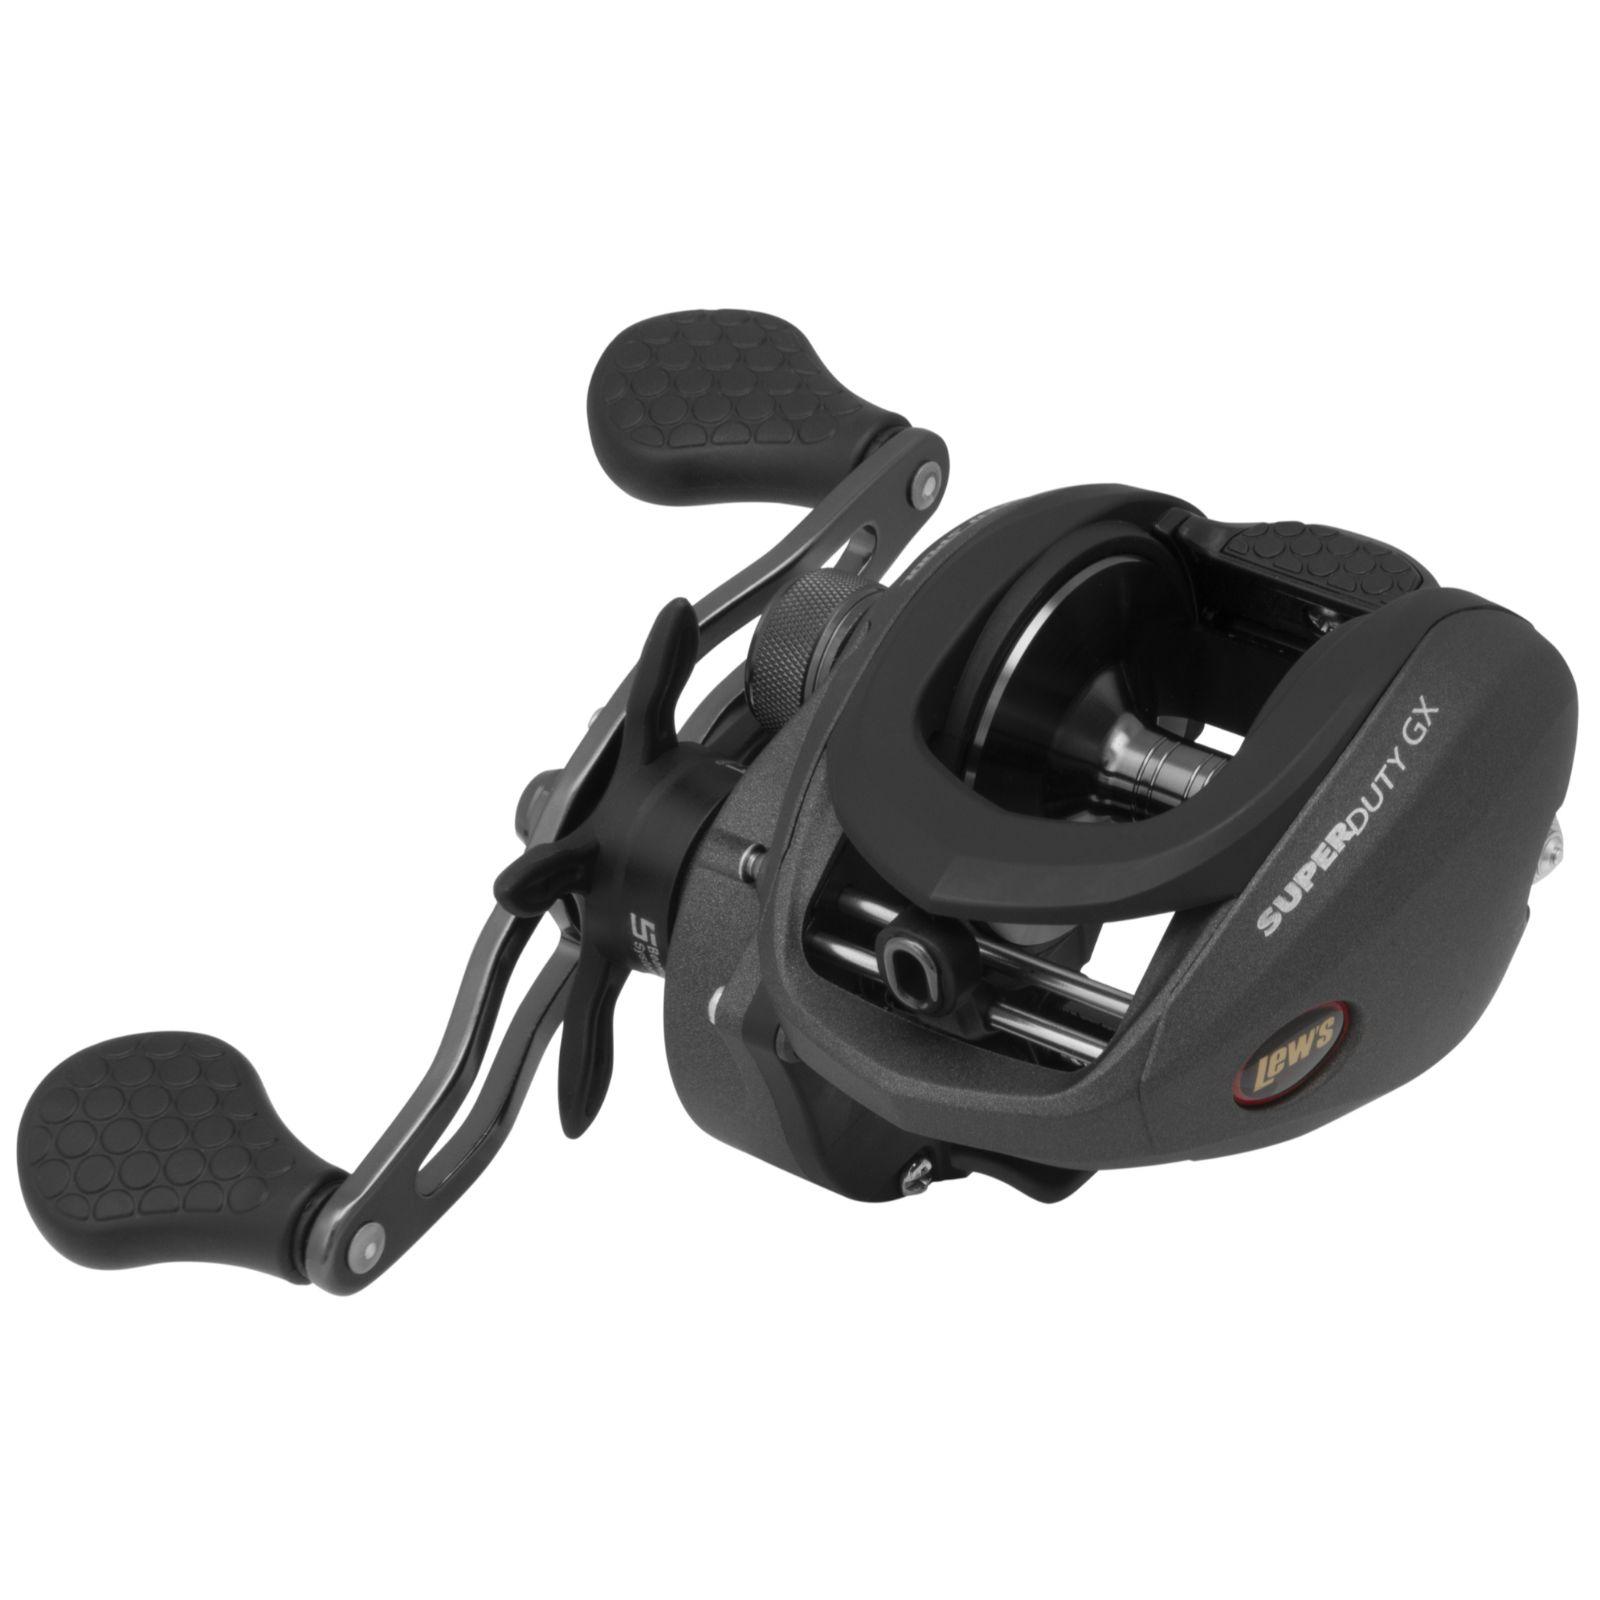 Lews Super Duty GX3 Speed Spool RH 6.5:1 Reel